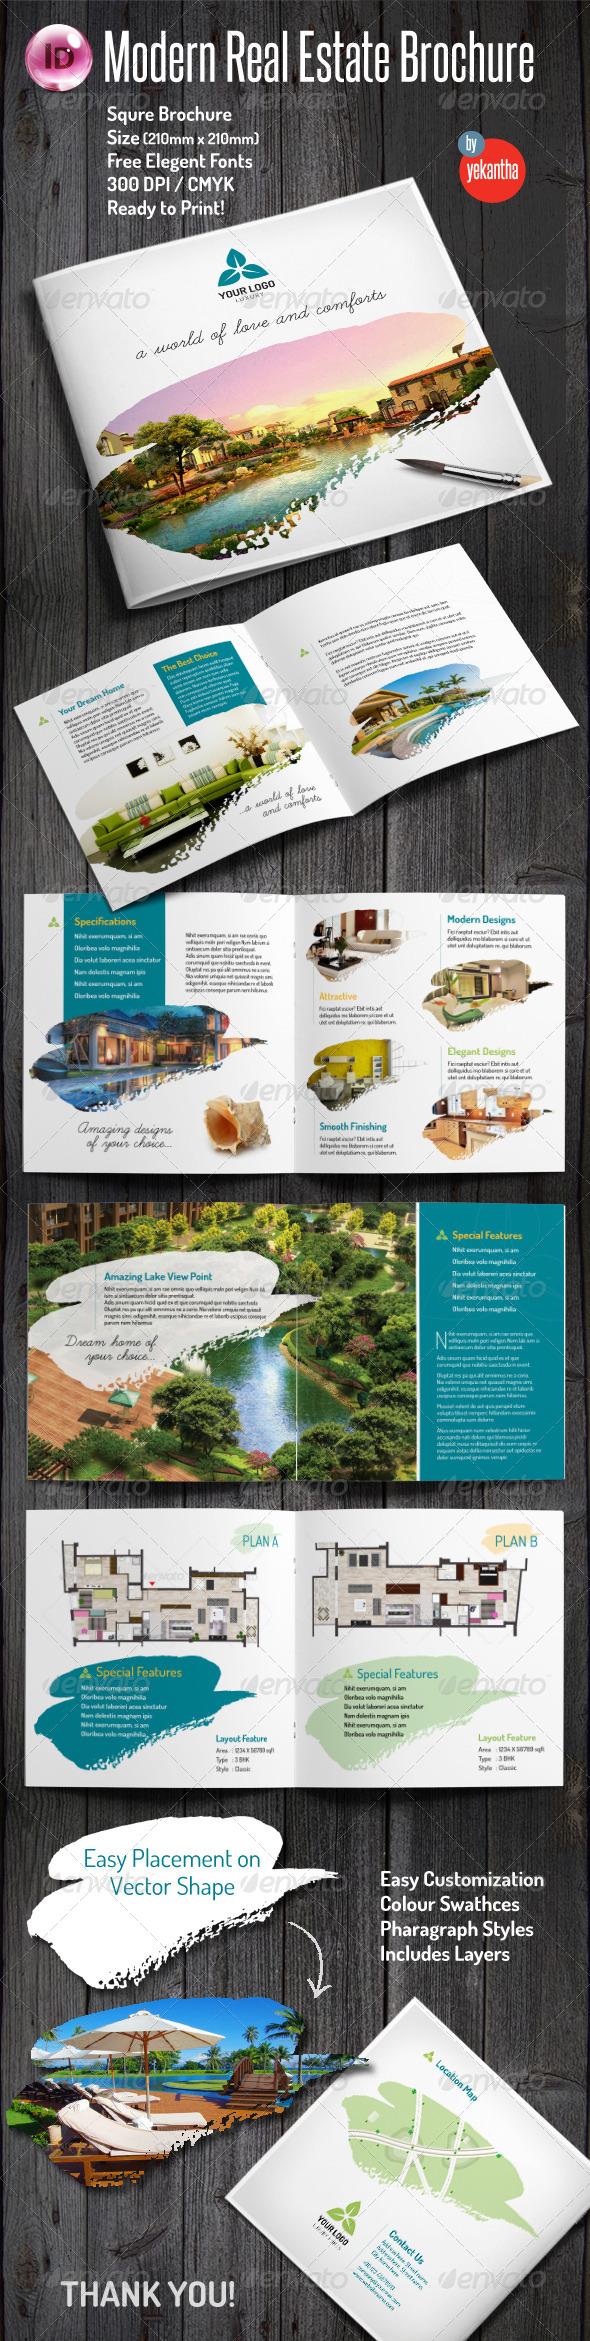 GraphicRiver Modern Real Estate Brochure 7974286